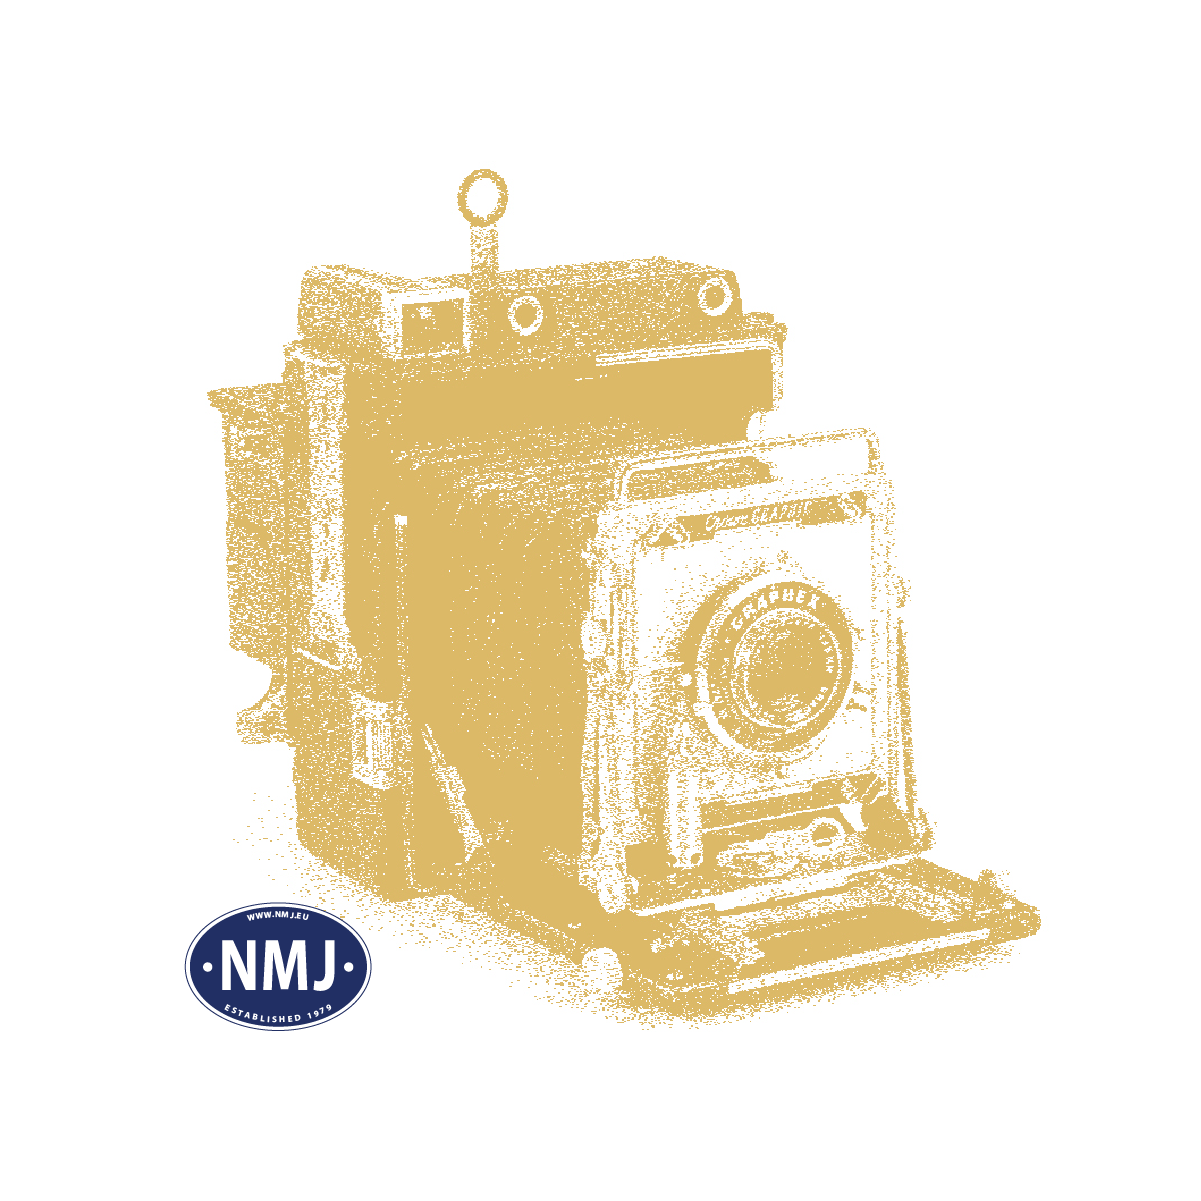 NMJT136.301 - NMJ Topline NSB CB2 21228 «Intercity Spesial» Erste Version von 1986